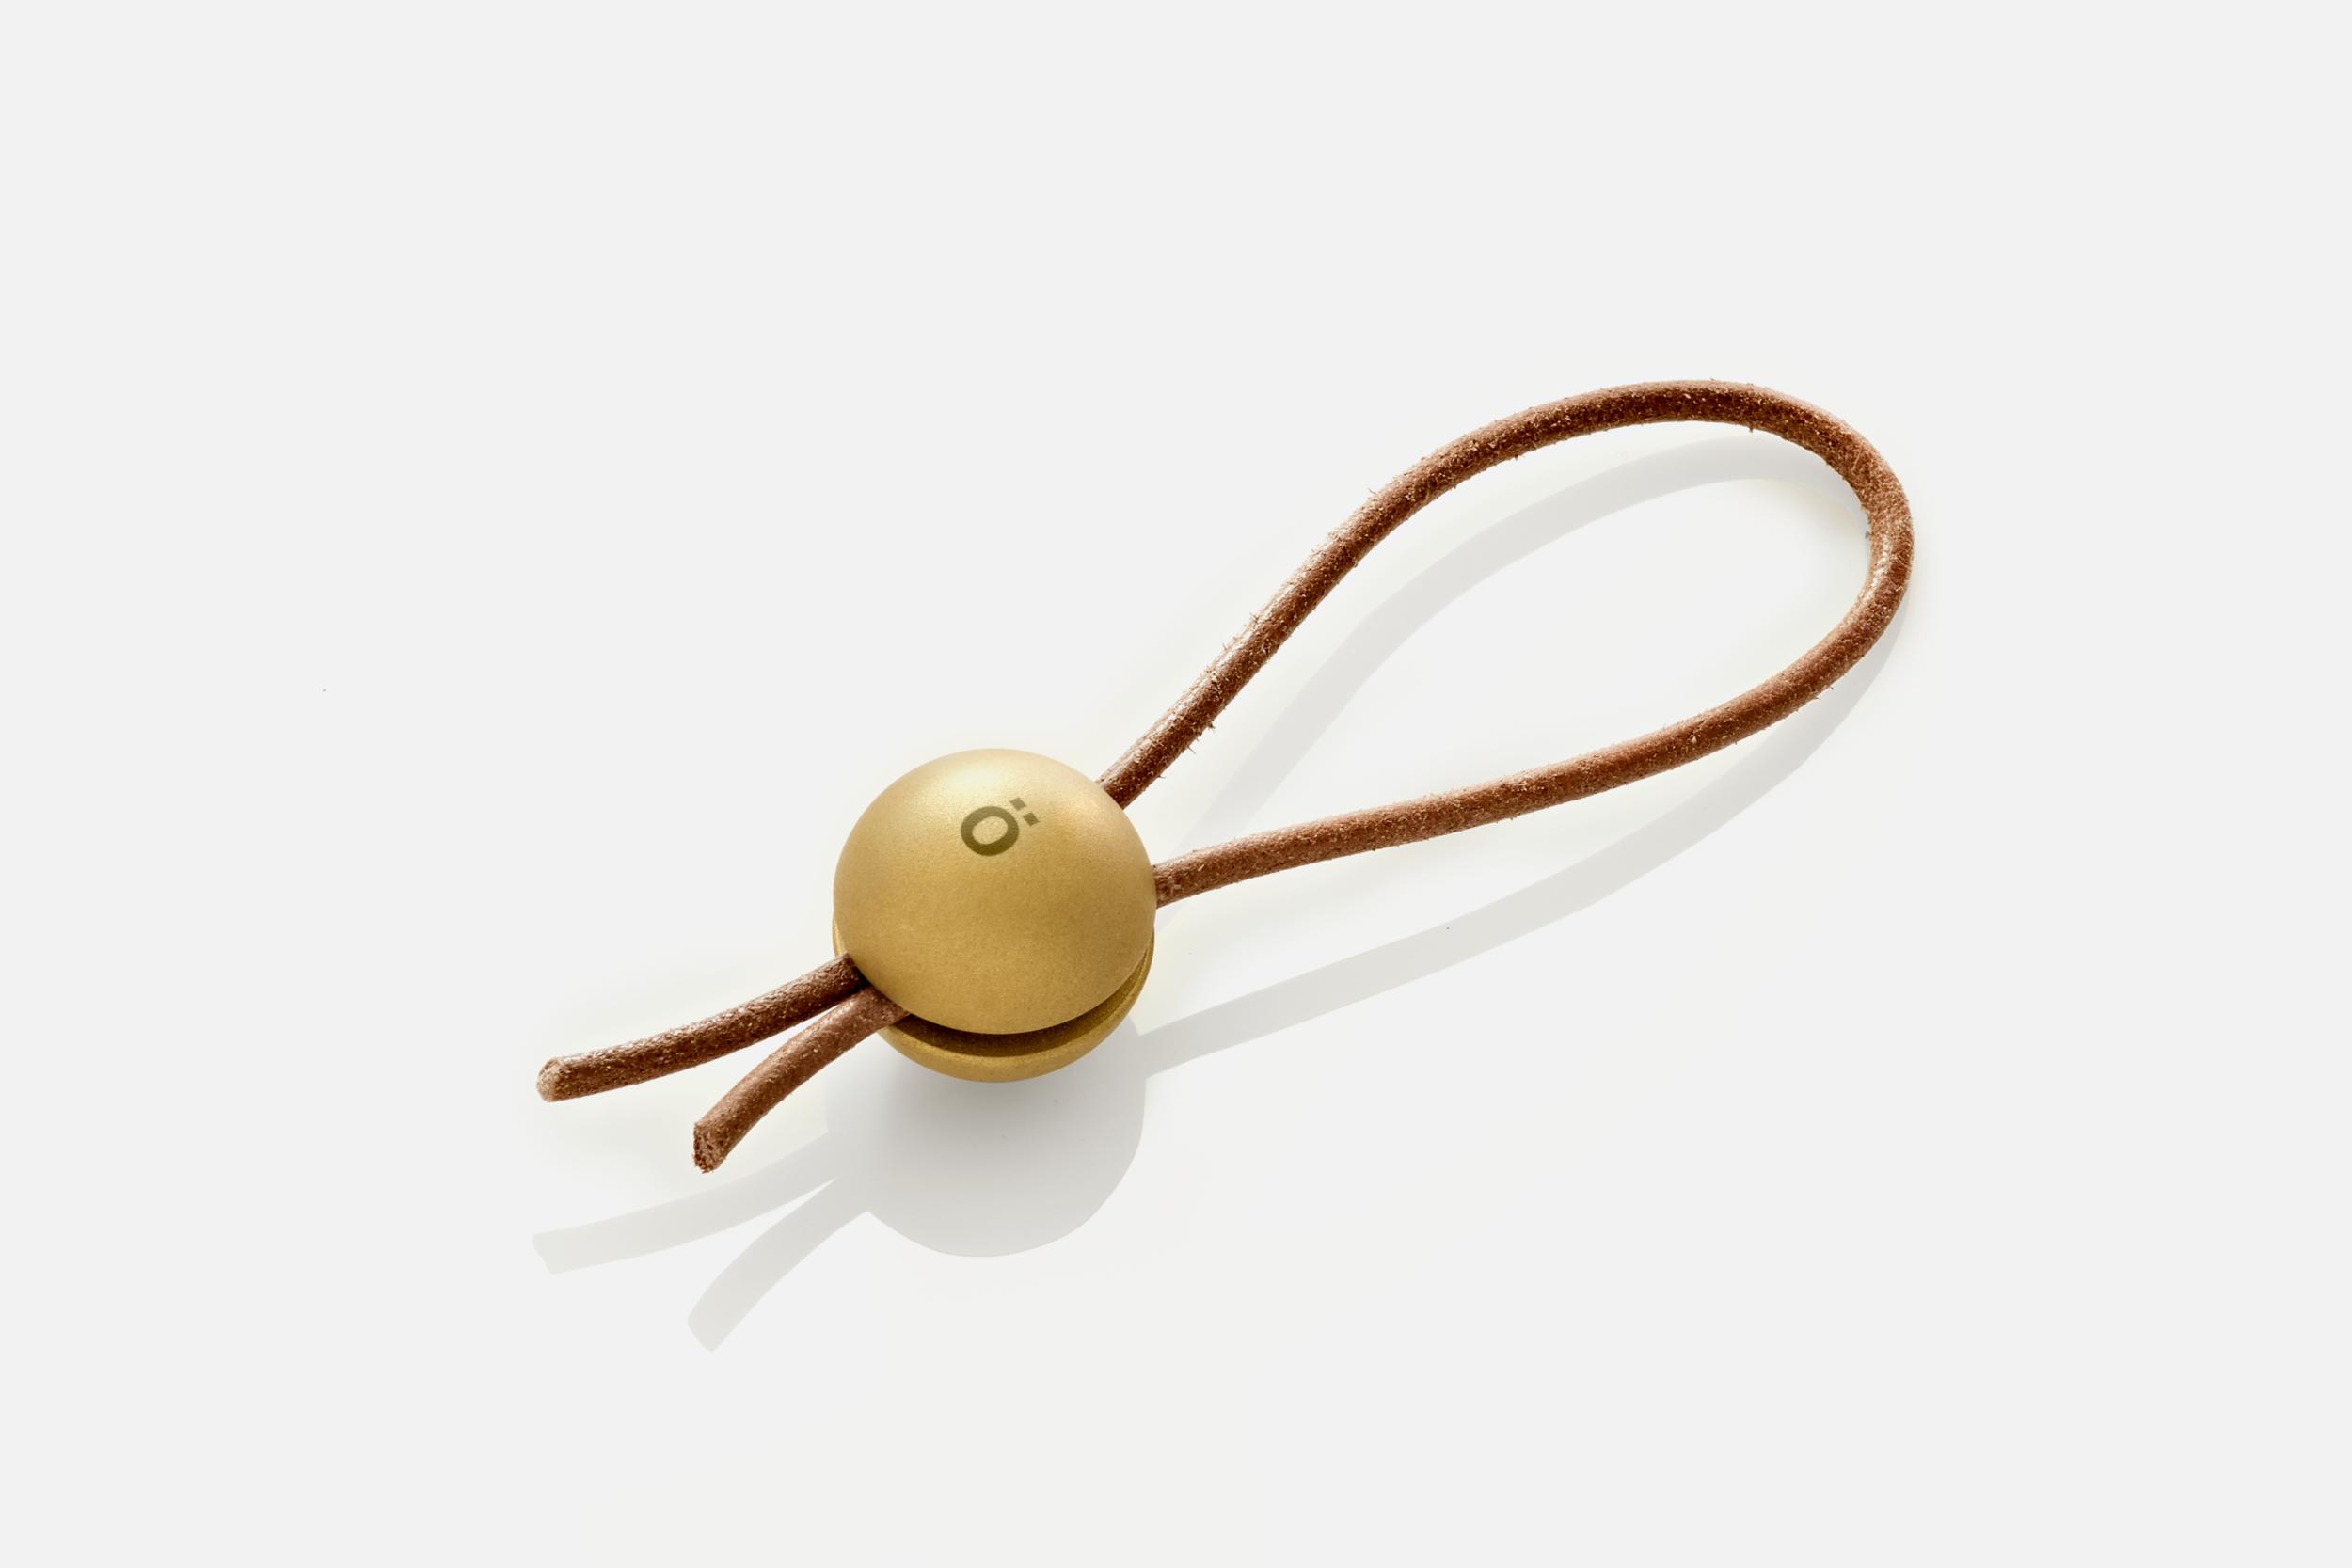 Nördic Key Ring - 1 pcs, 28 mmStainless steel, matt, naturalDesign by H O W, Magnus JørgensenArt. no.: 90513